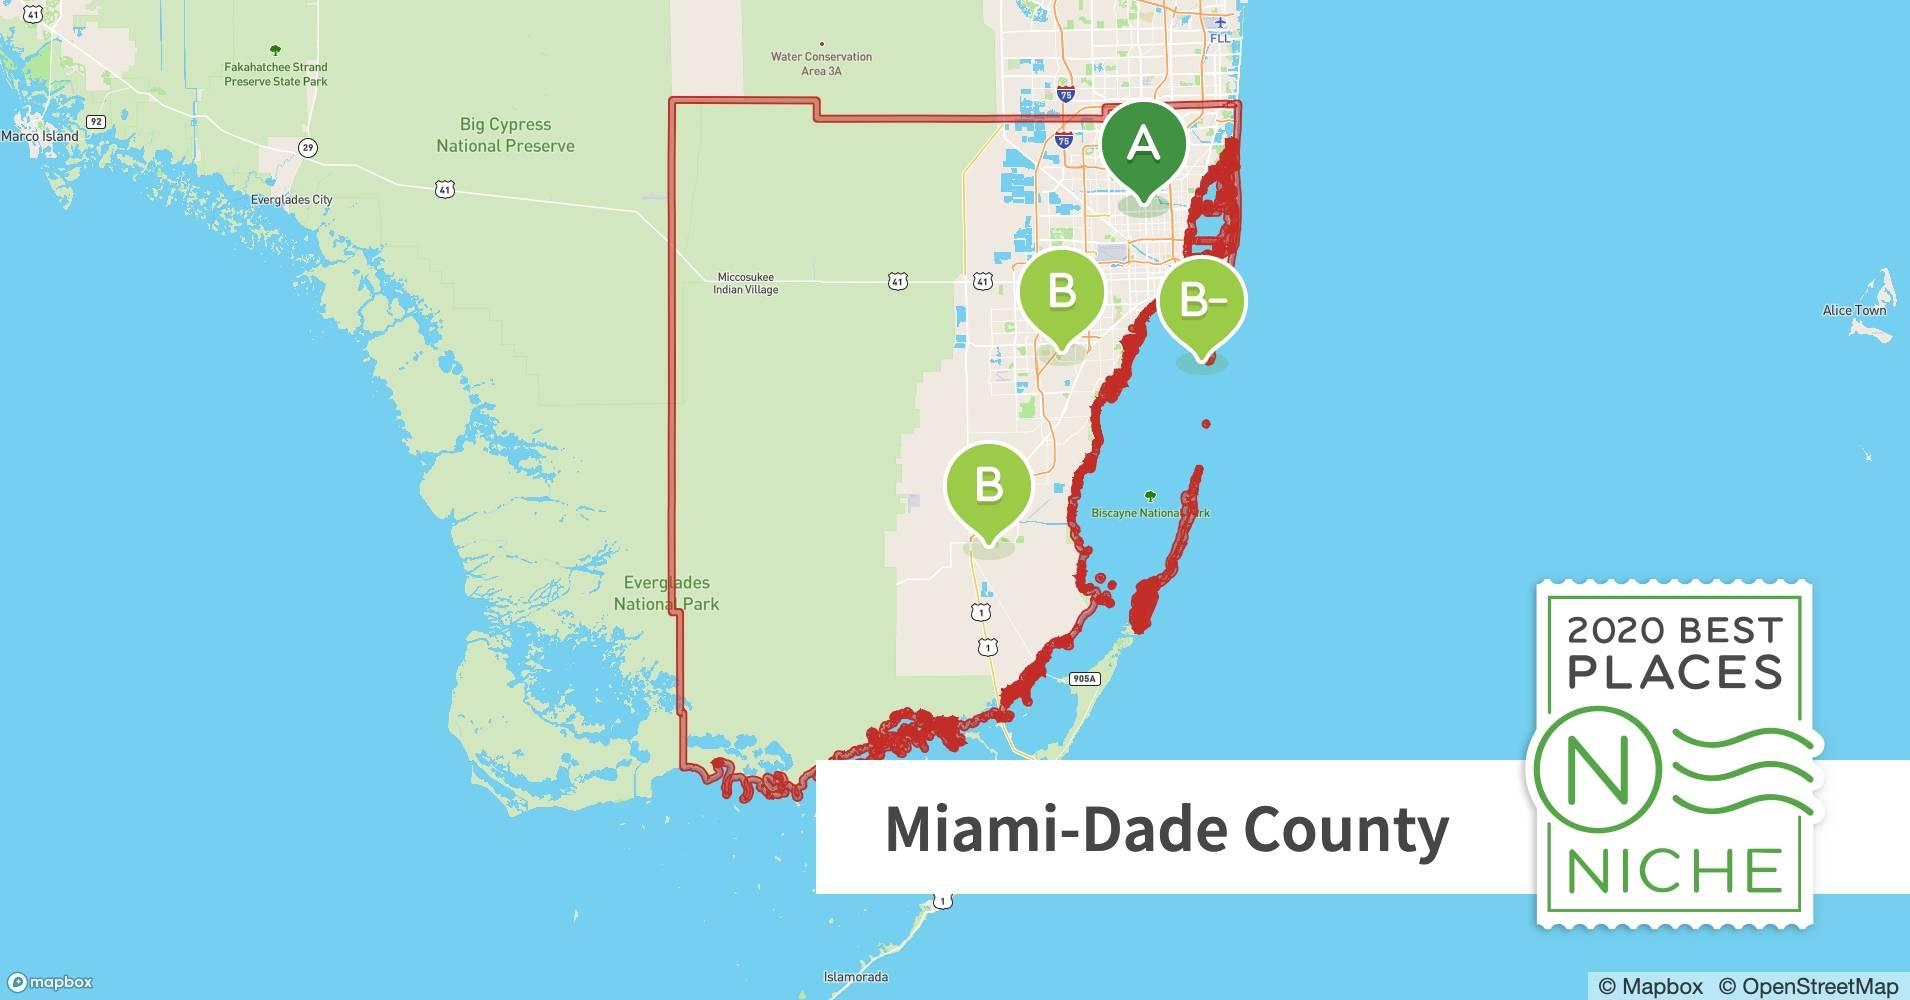 2020 best places to retire in miami-dade county, fl - niche